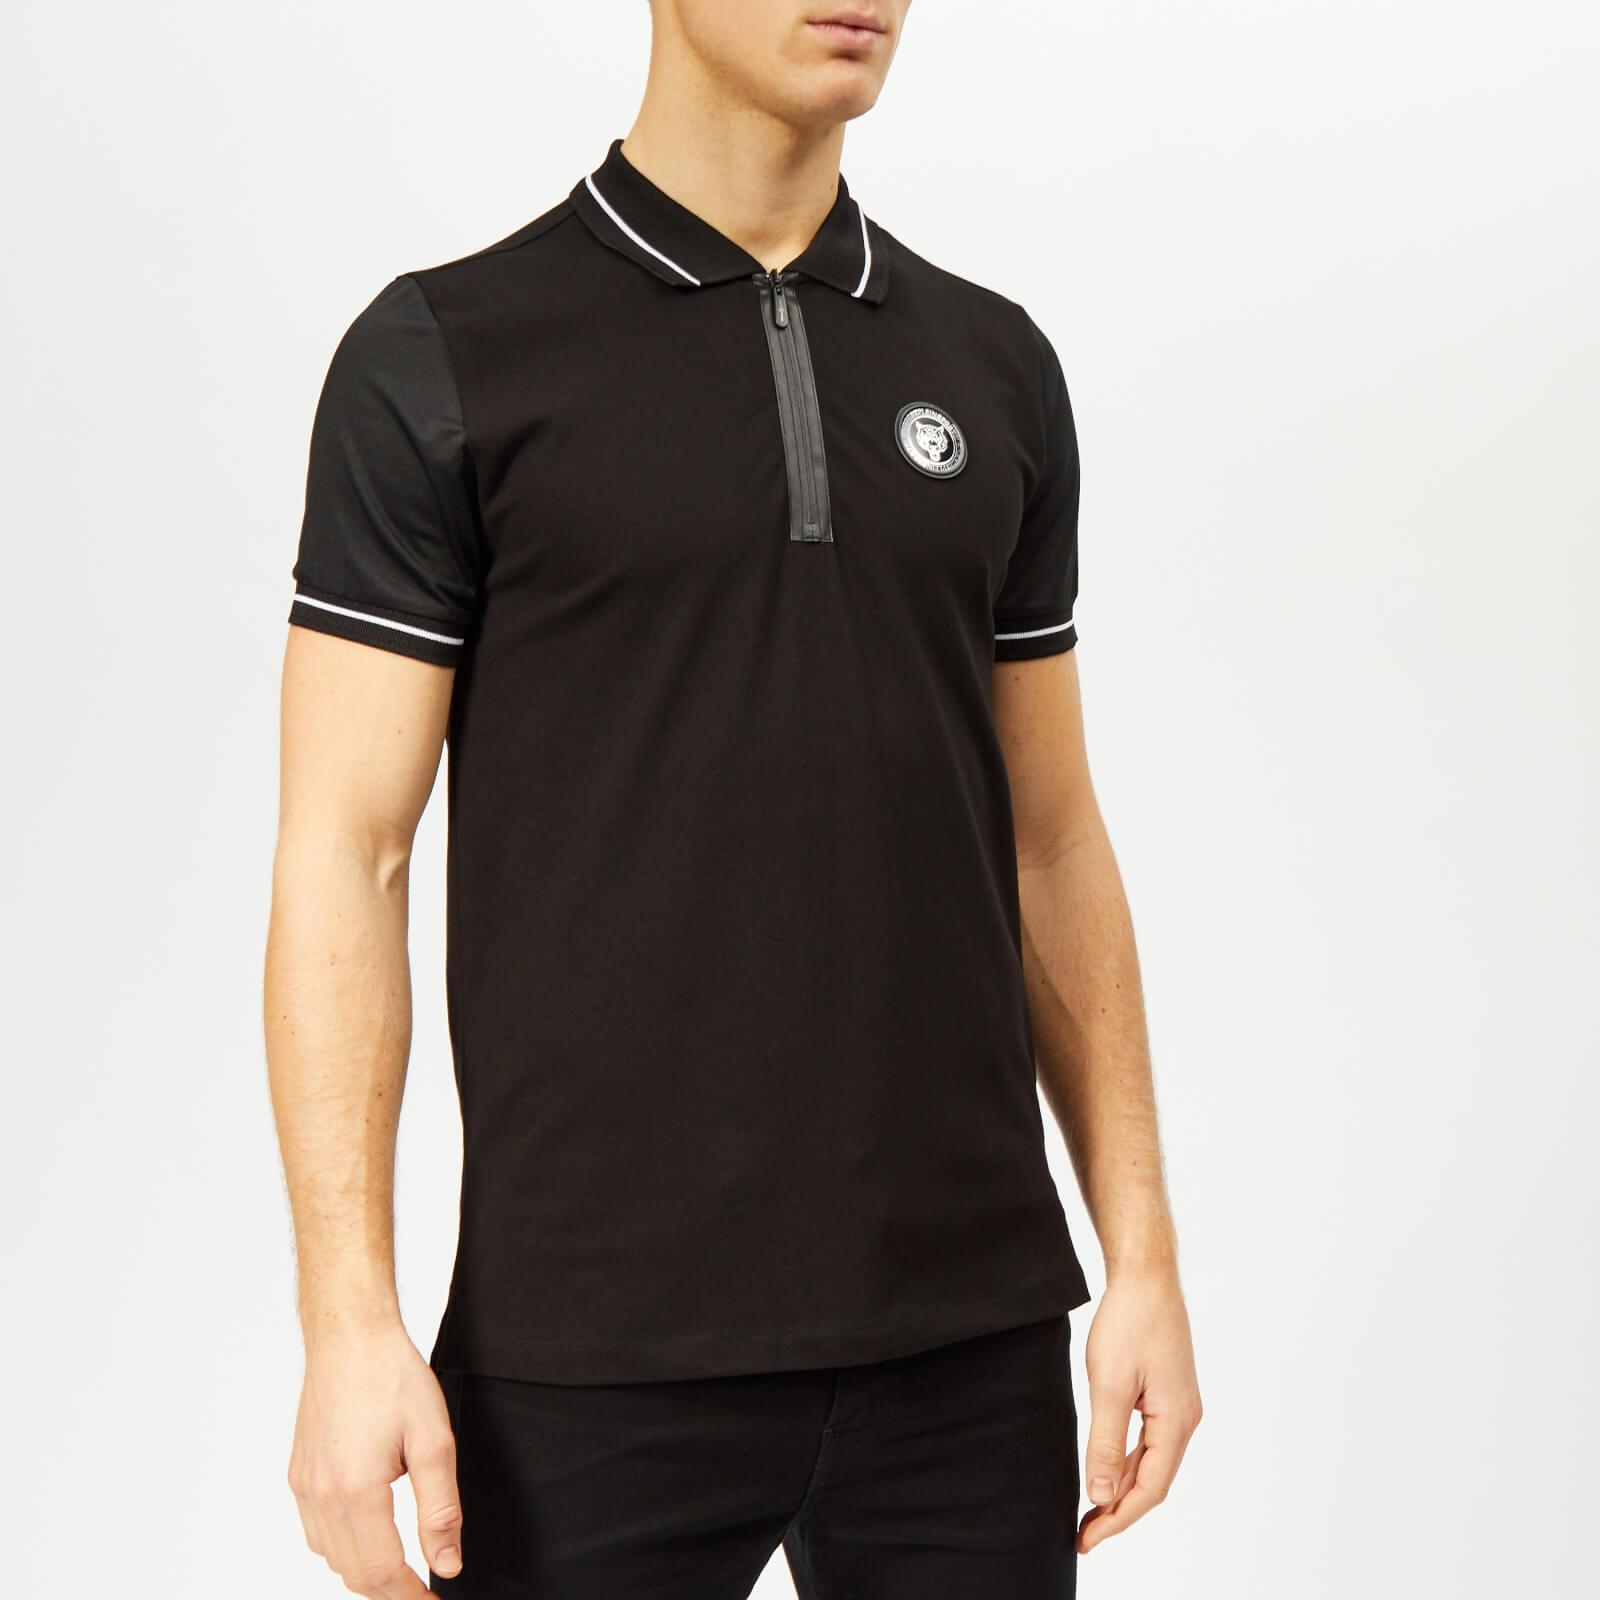 Plein Sport Men's Statement Polo-Shirt - Black/White - XL - Black/White